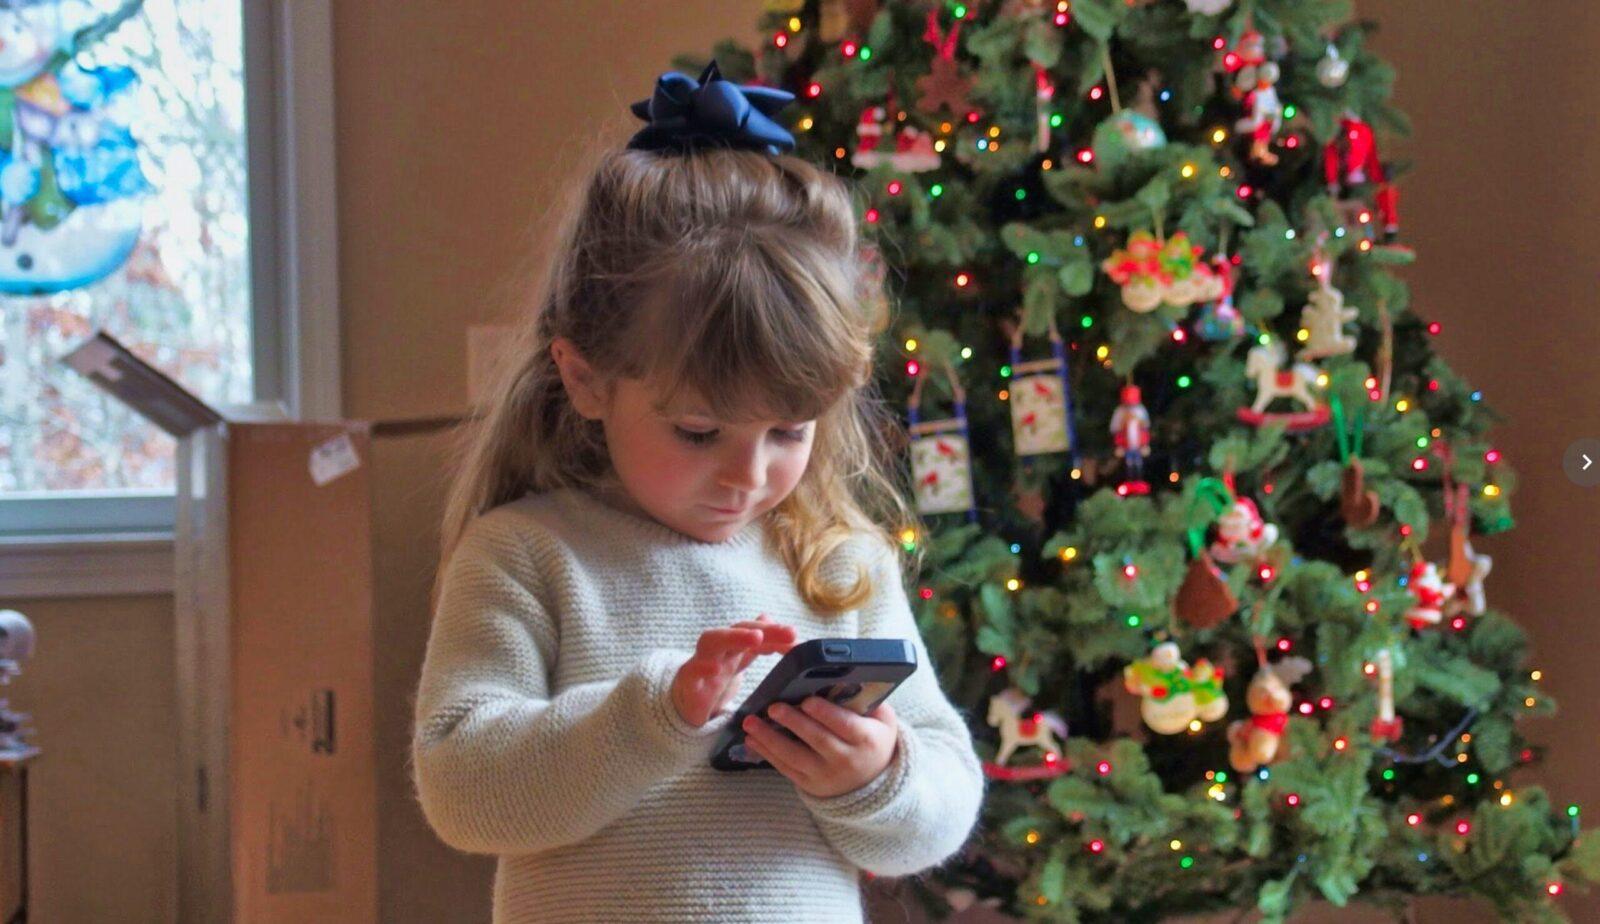 girl holding smartphone near Christmas tree